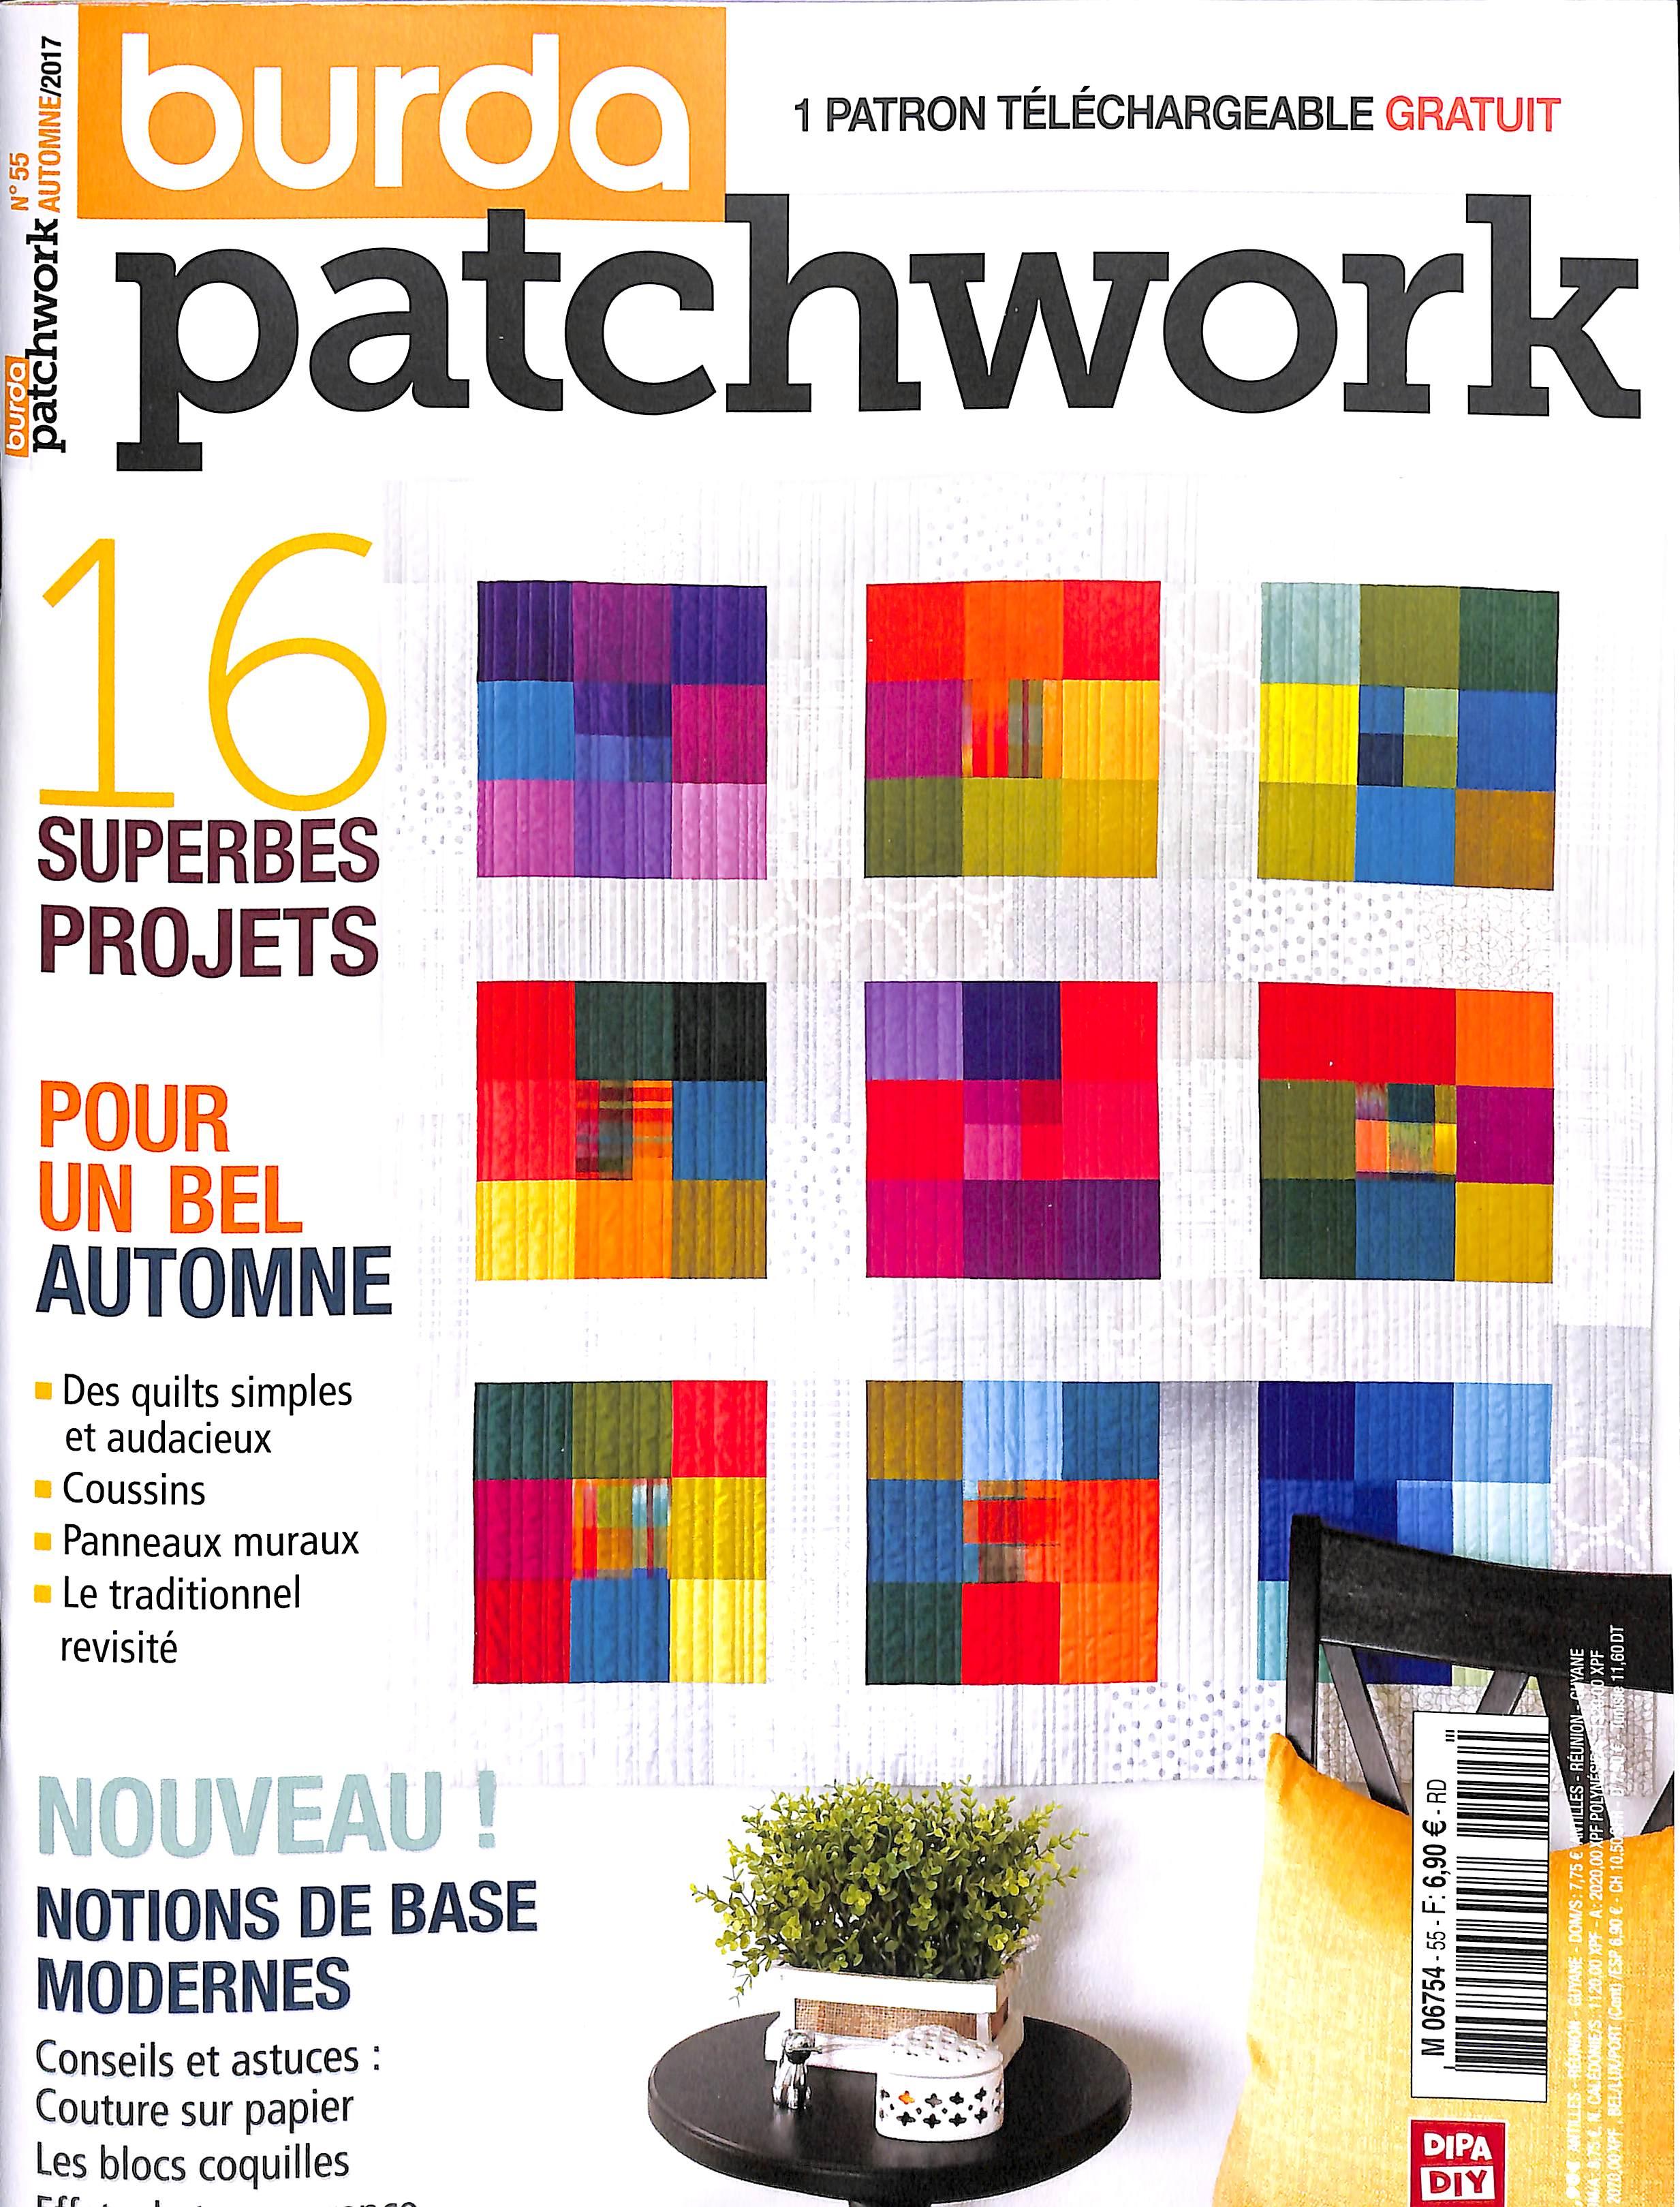 Burda Patchwork N° 55 Août 2017